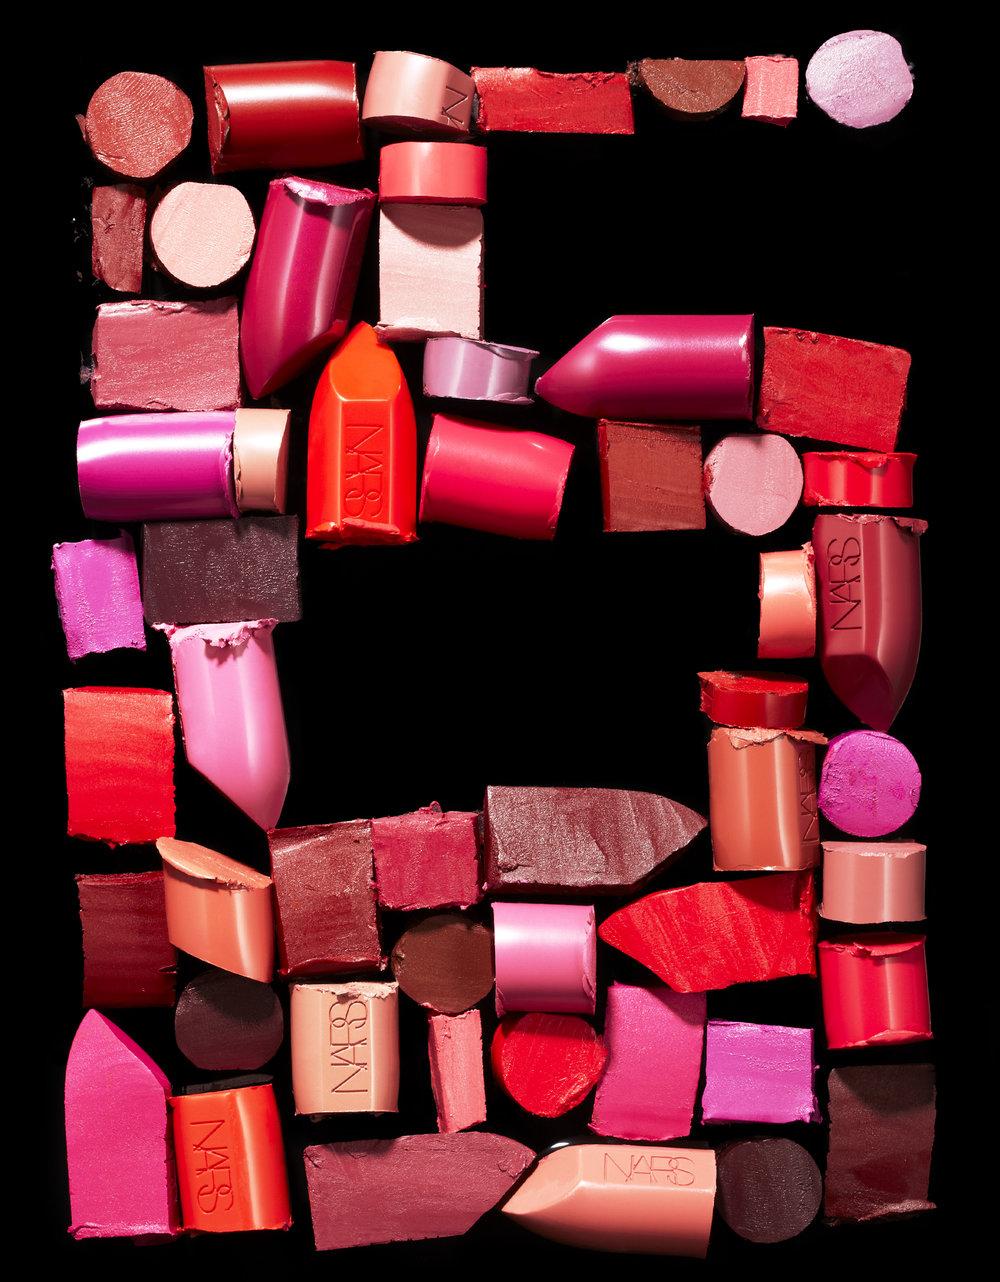 NARS Lipstick Editorial